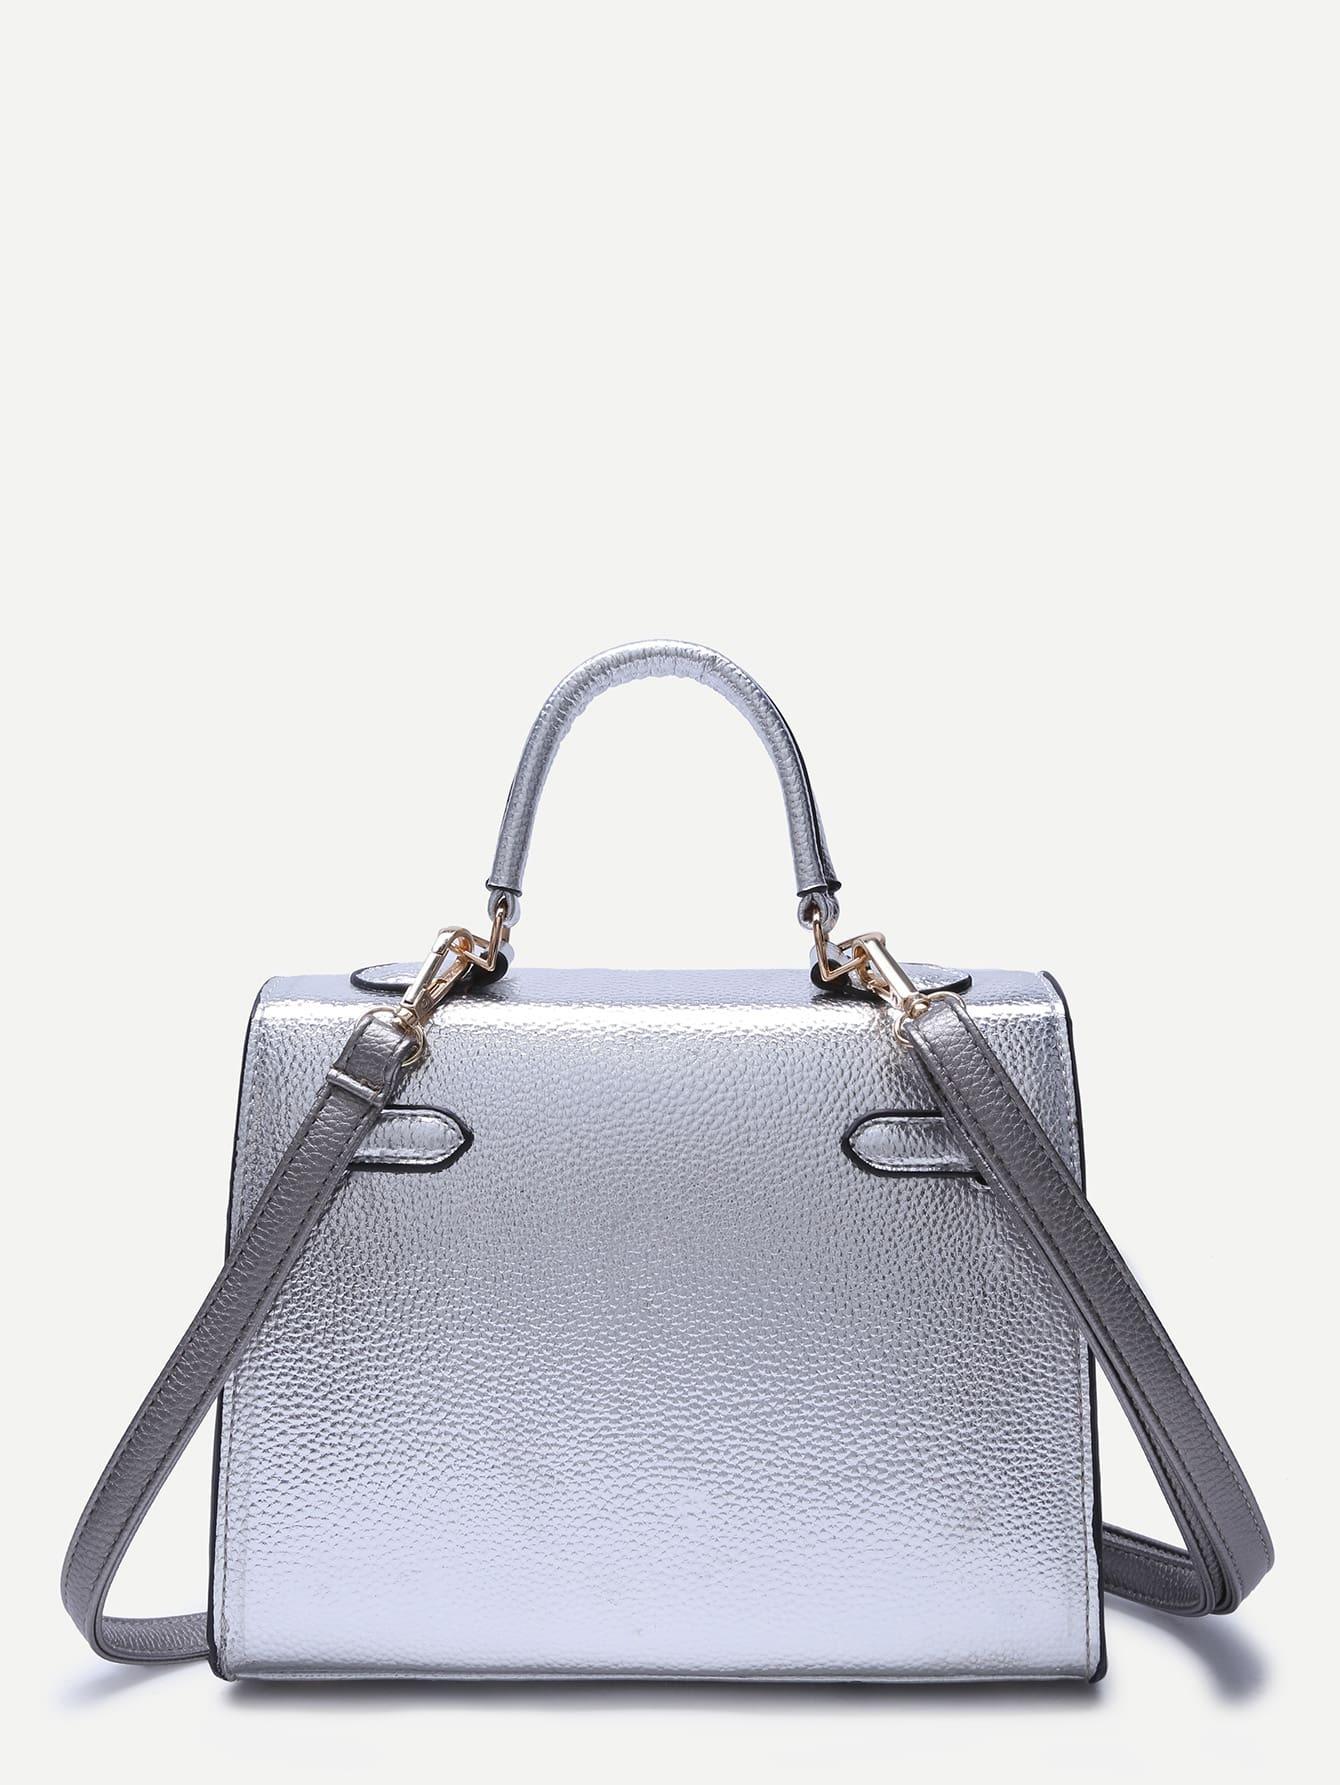 bag161109913_2